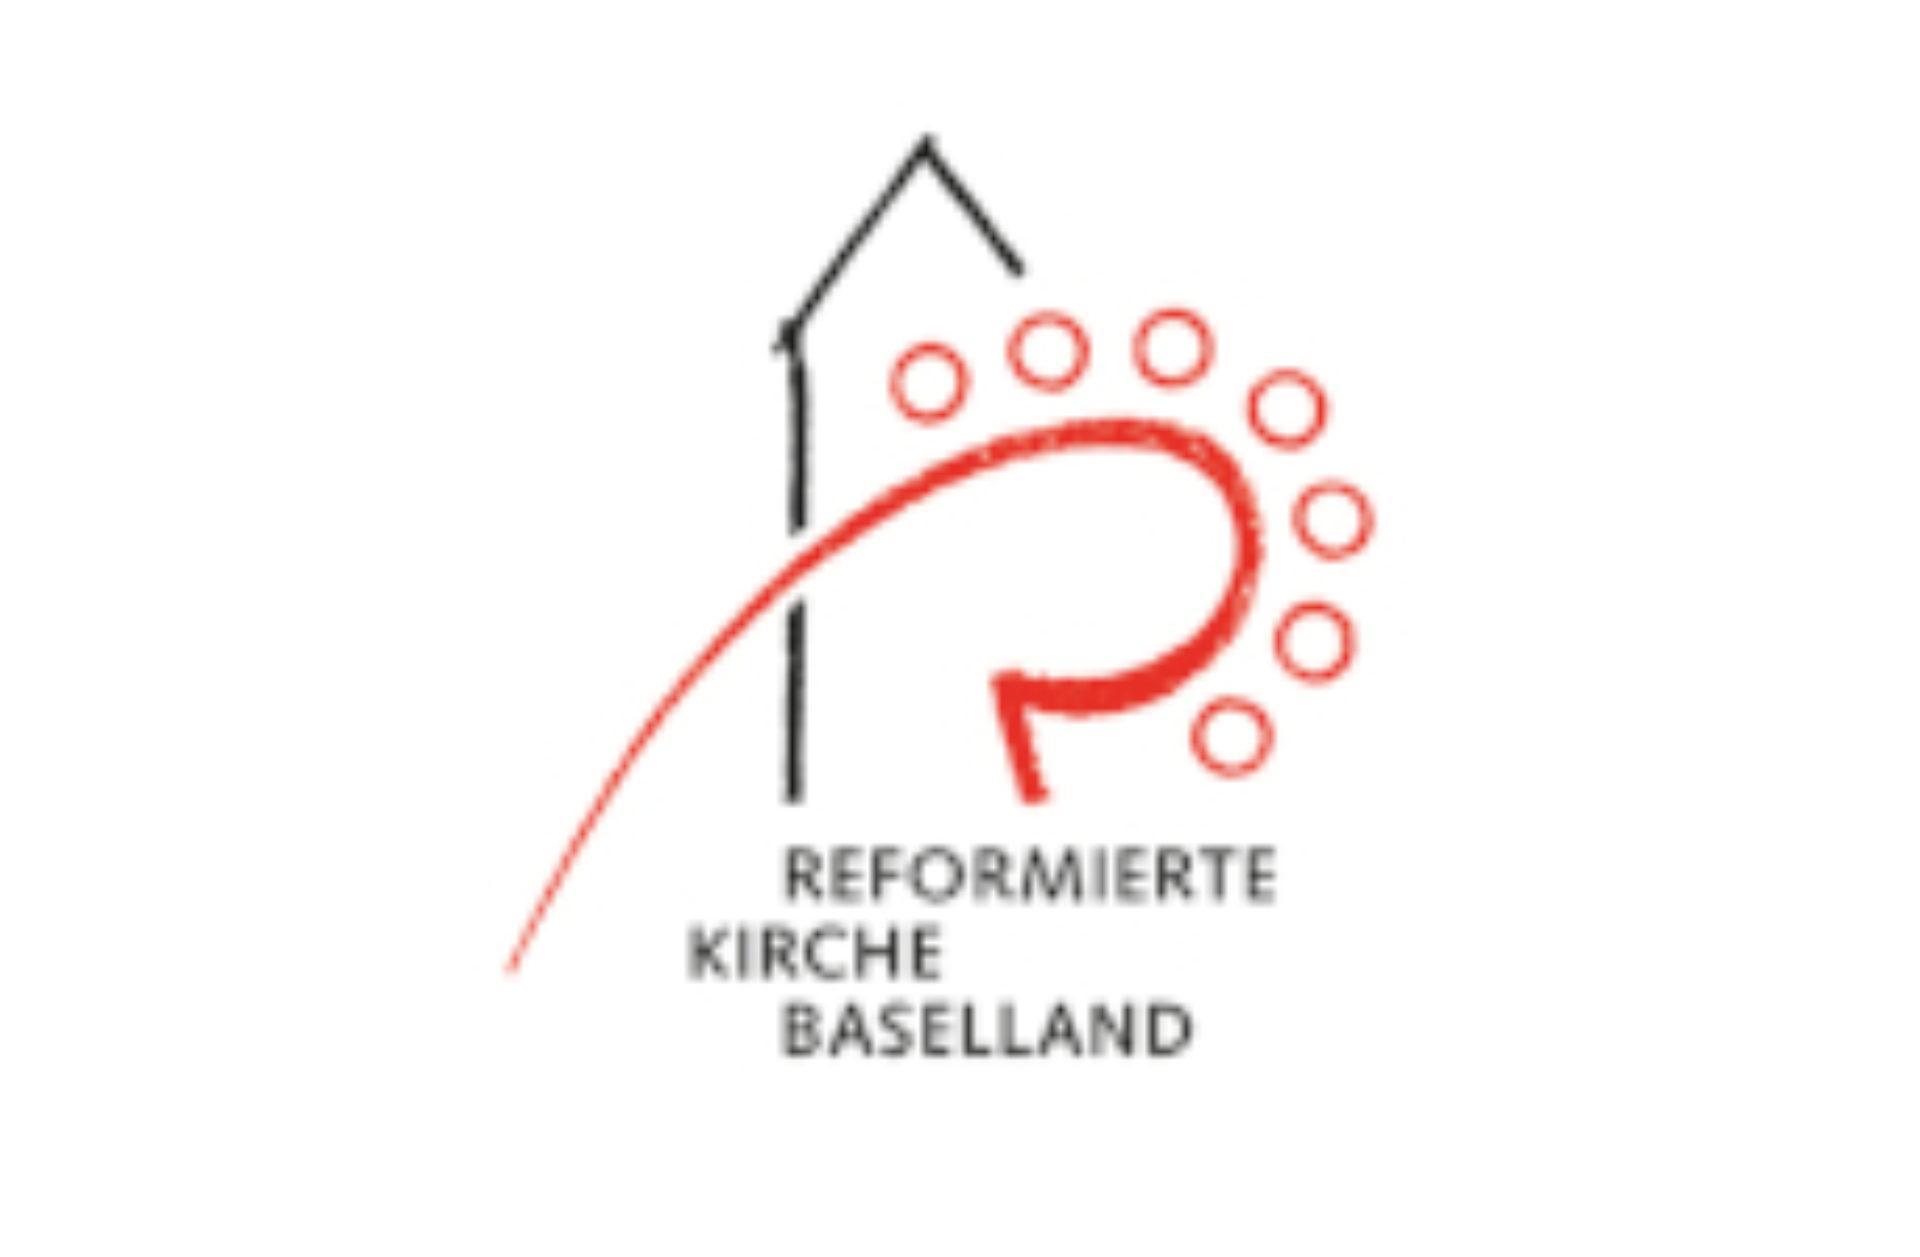 Evangelisch-reformierten Kirche des Kantons Basel-Landschaft